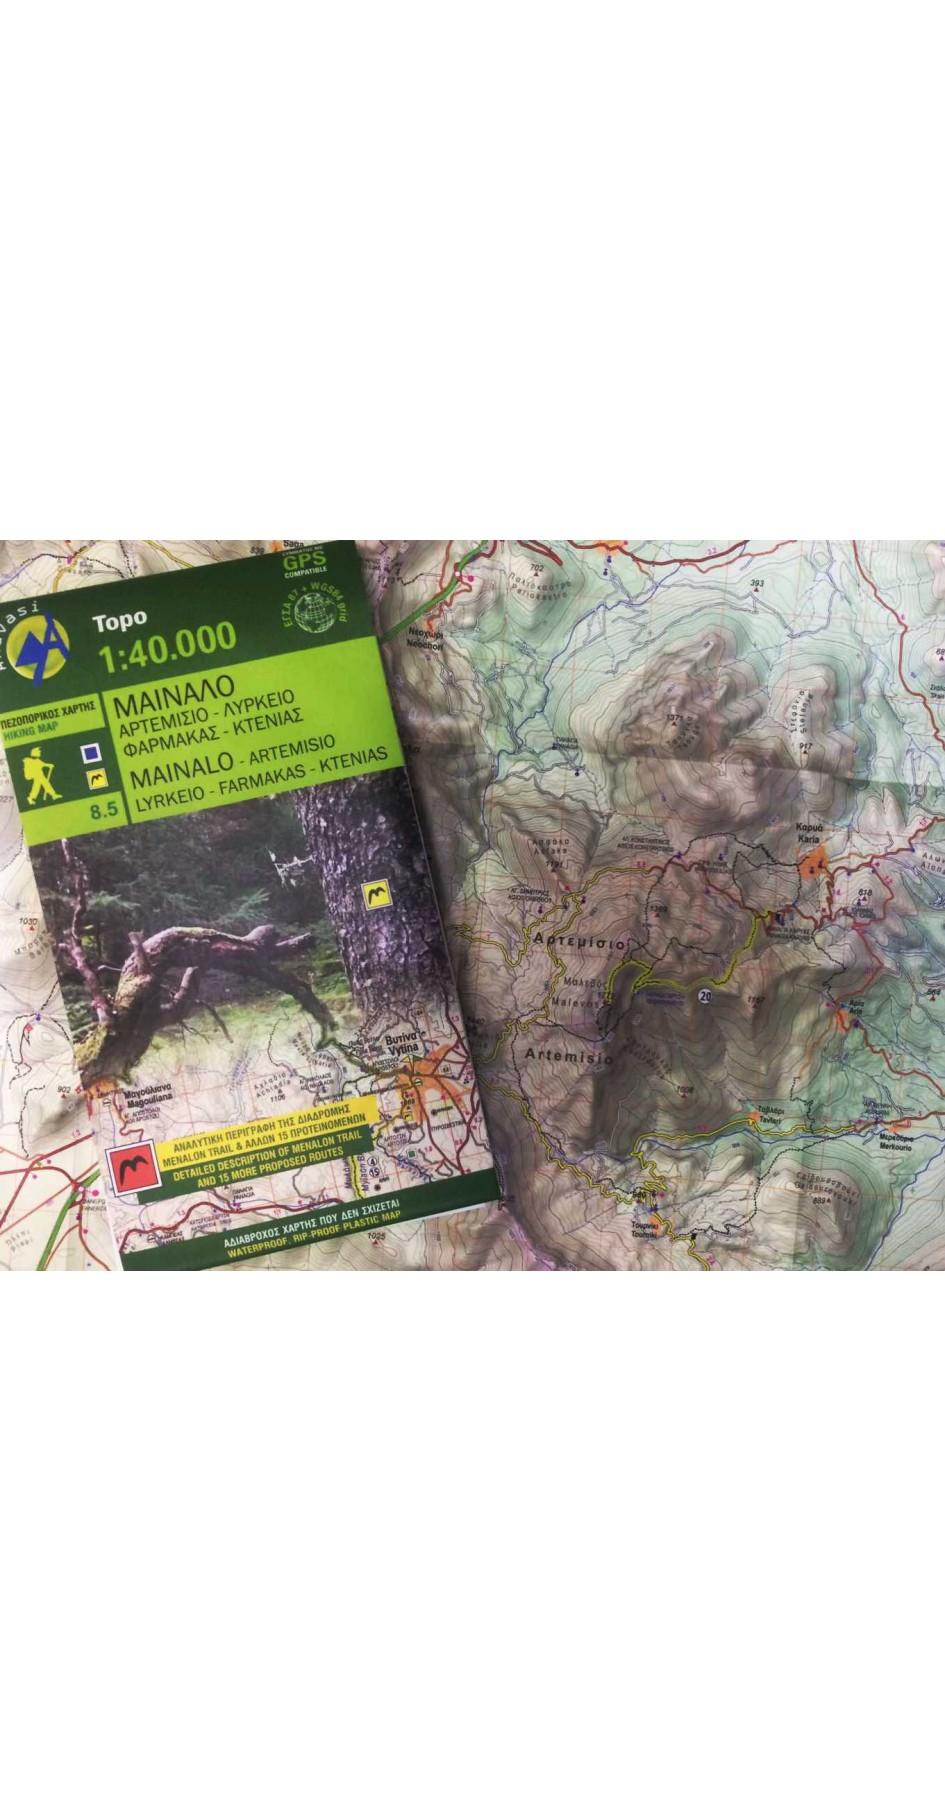 Mainalo - Artemisio • Hiking map 1:40000